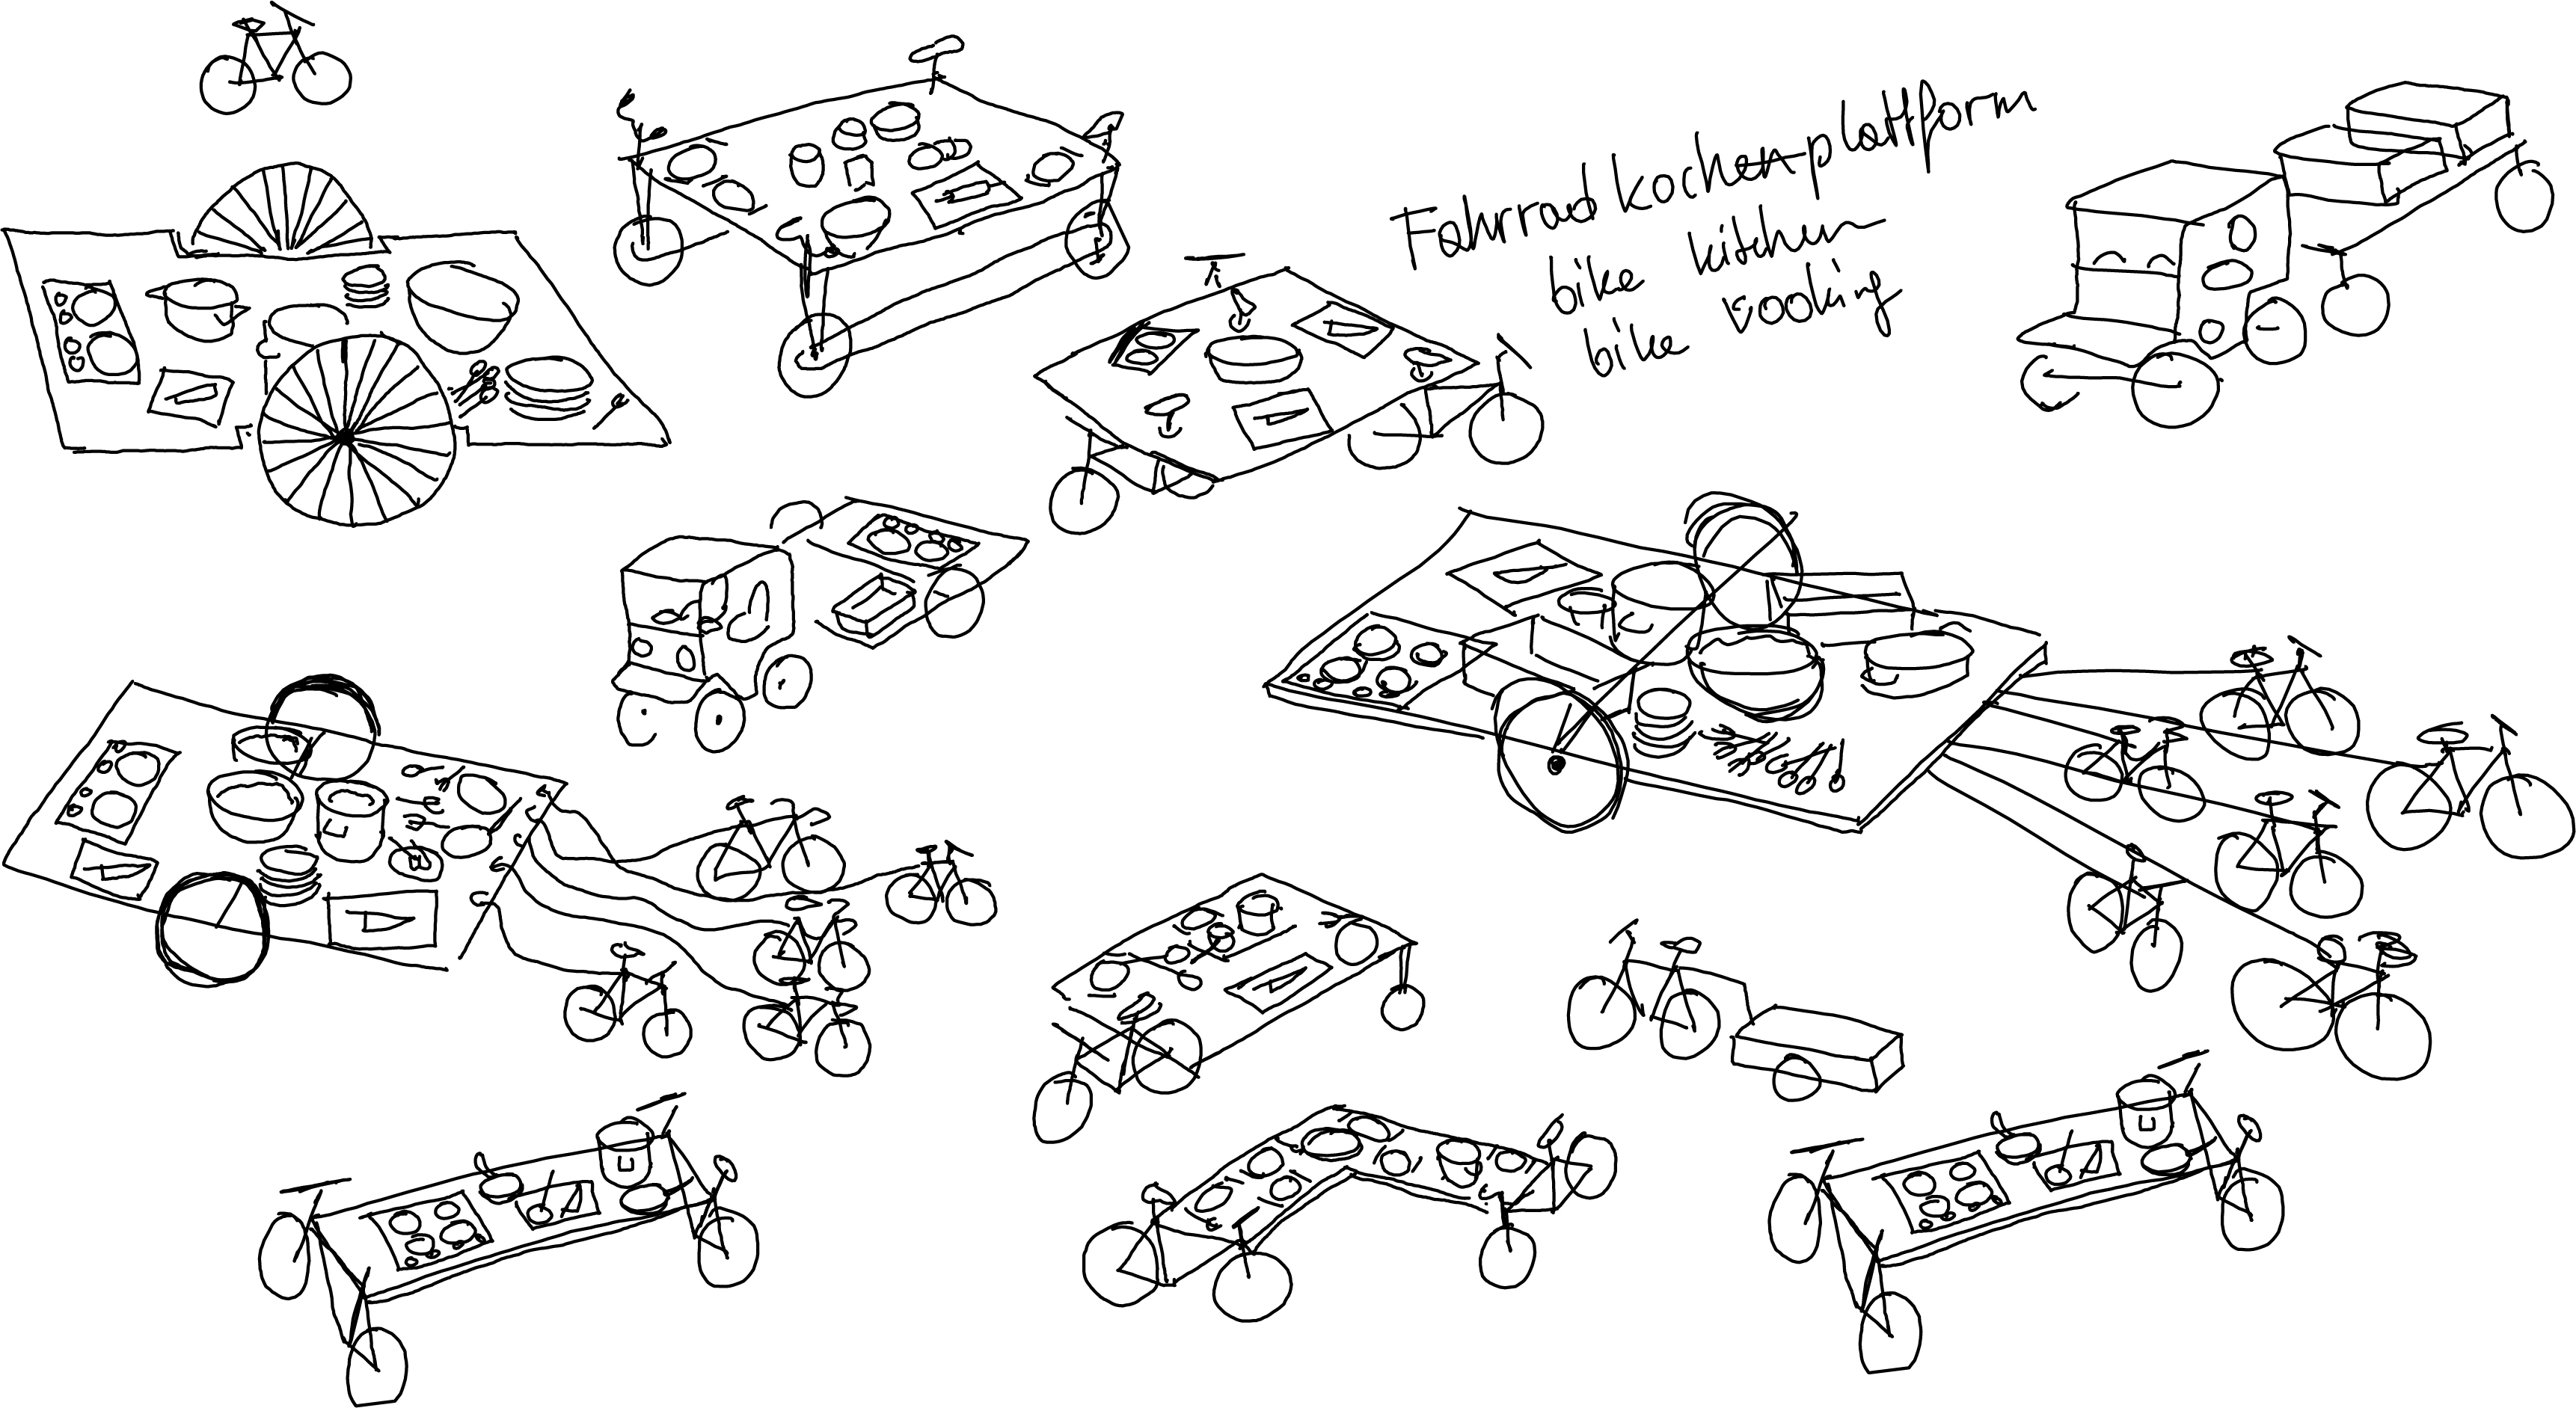 fahrradtisch-skizze.jpg